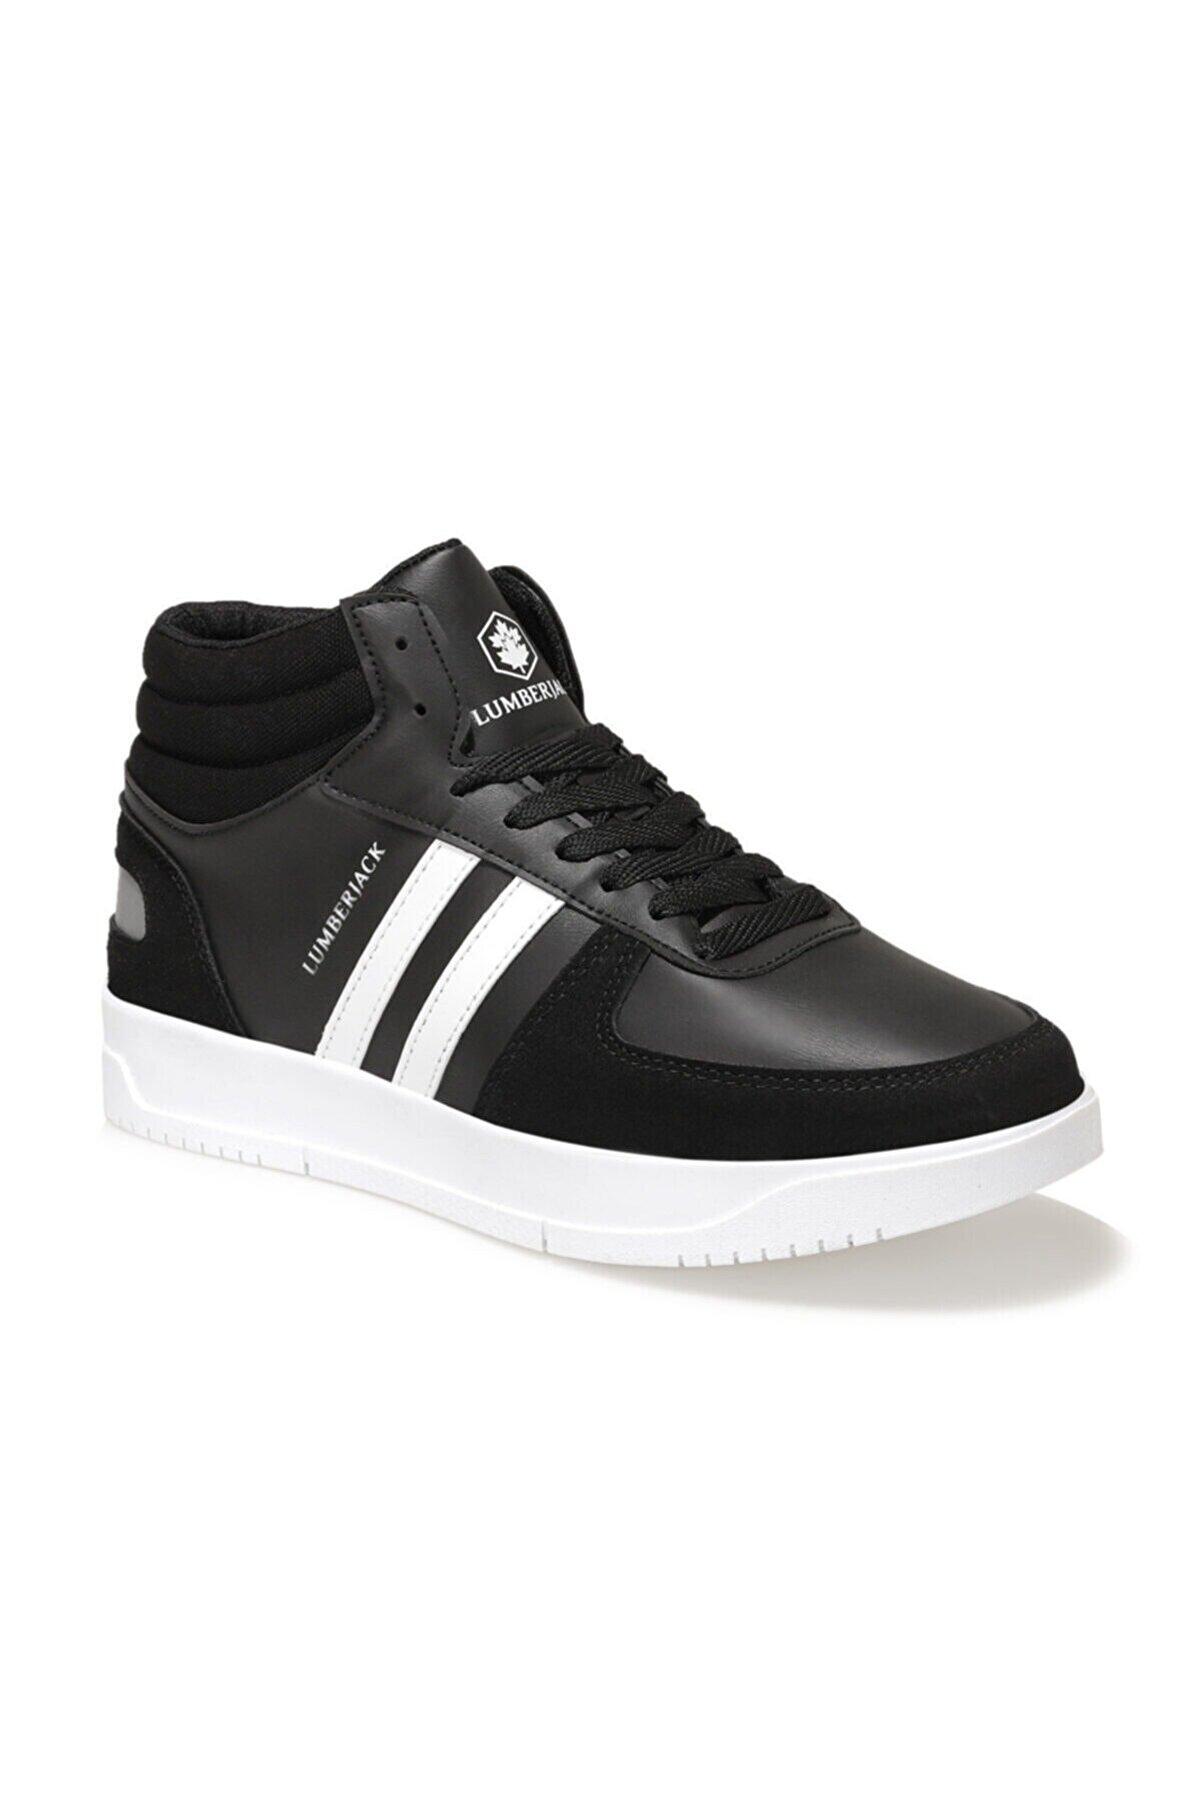 Lumberjack KLAN HI 1FX Siyah Erkek Sneaker Ayakkabı 100785443